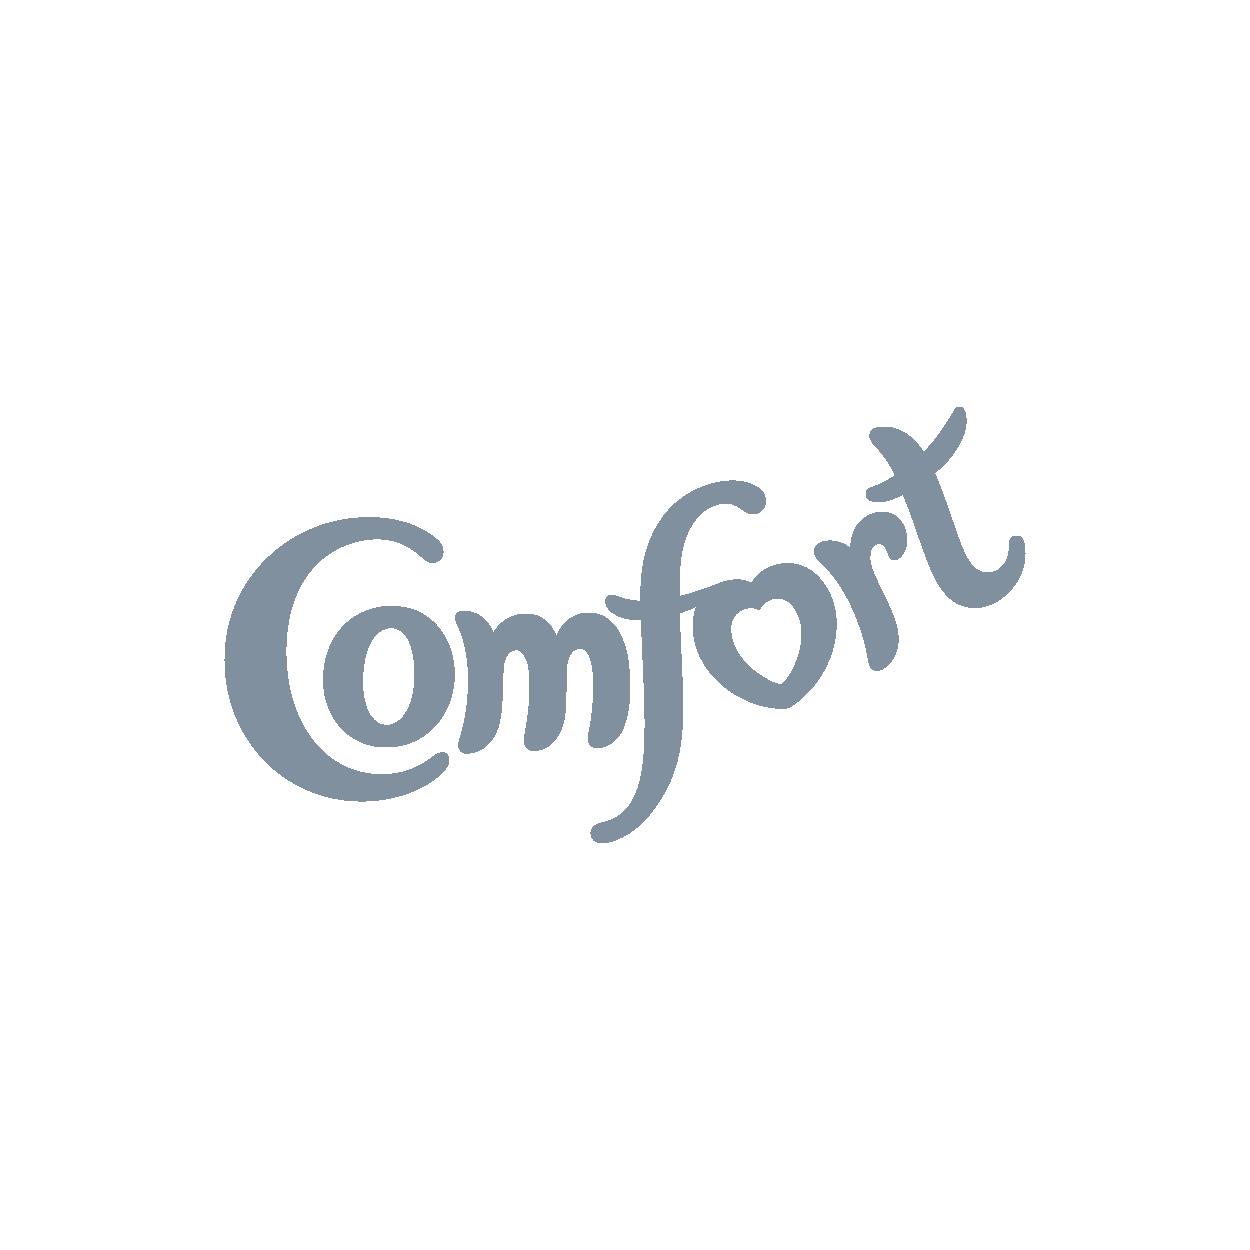 Comfort logo